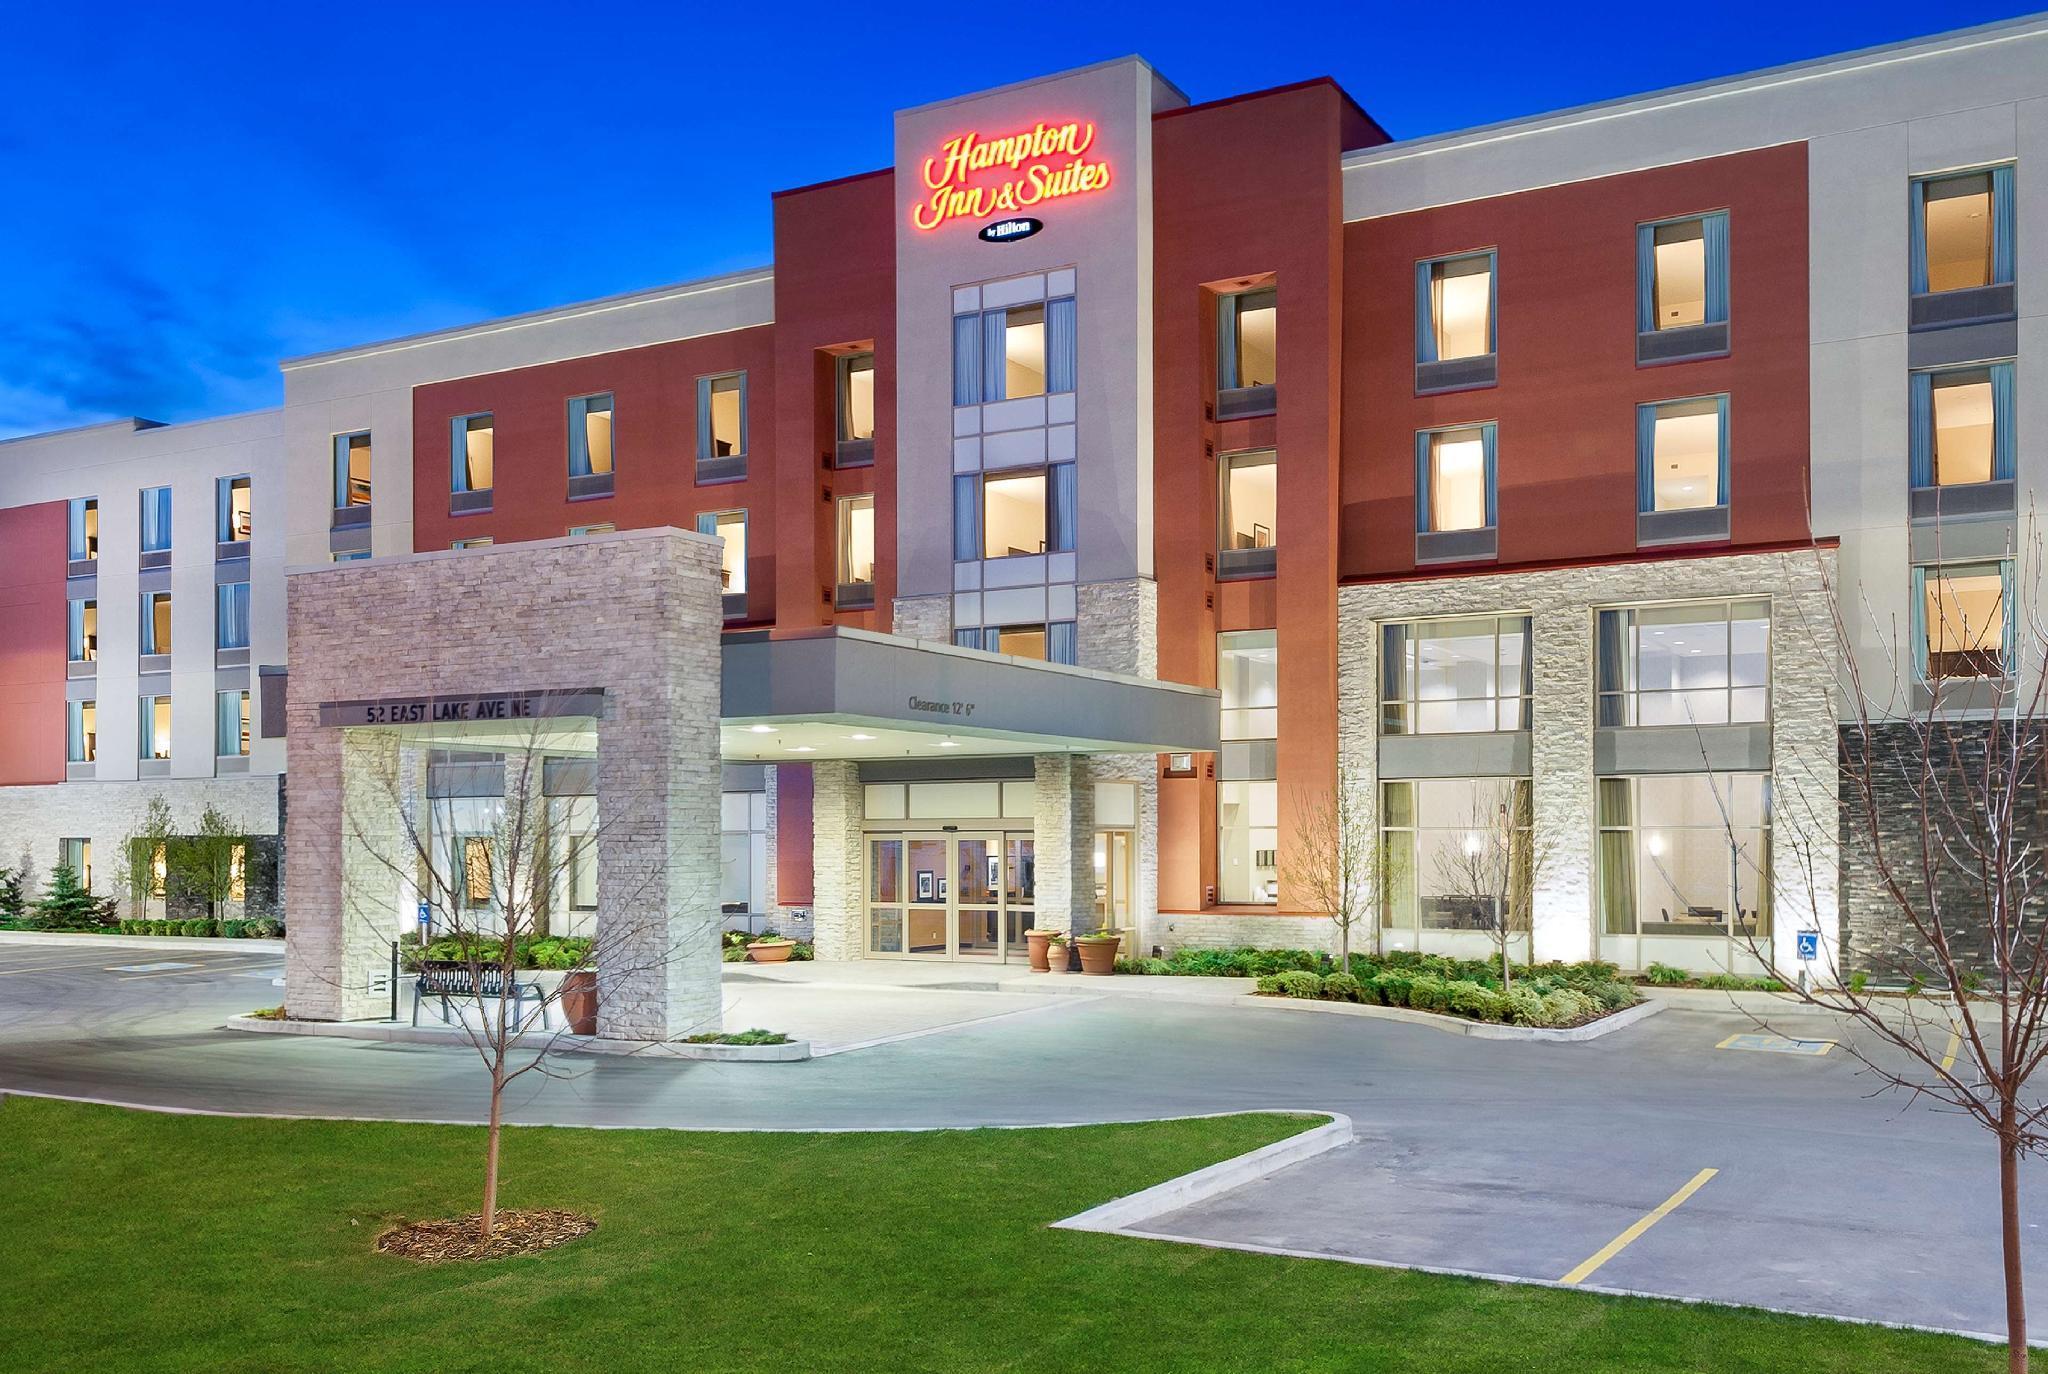 Hampton Inn And Suites Airdrie